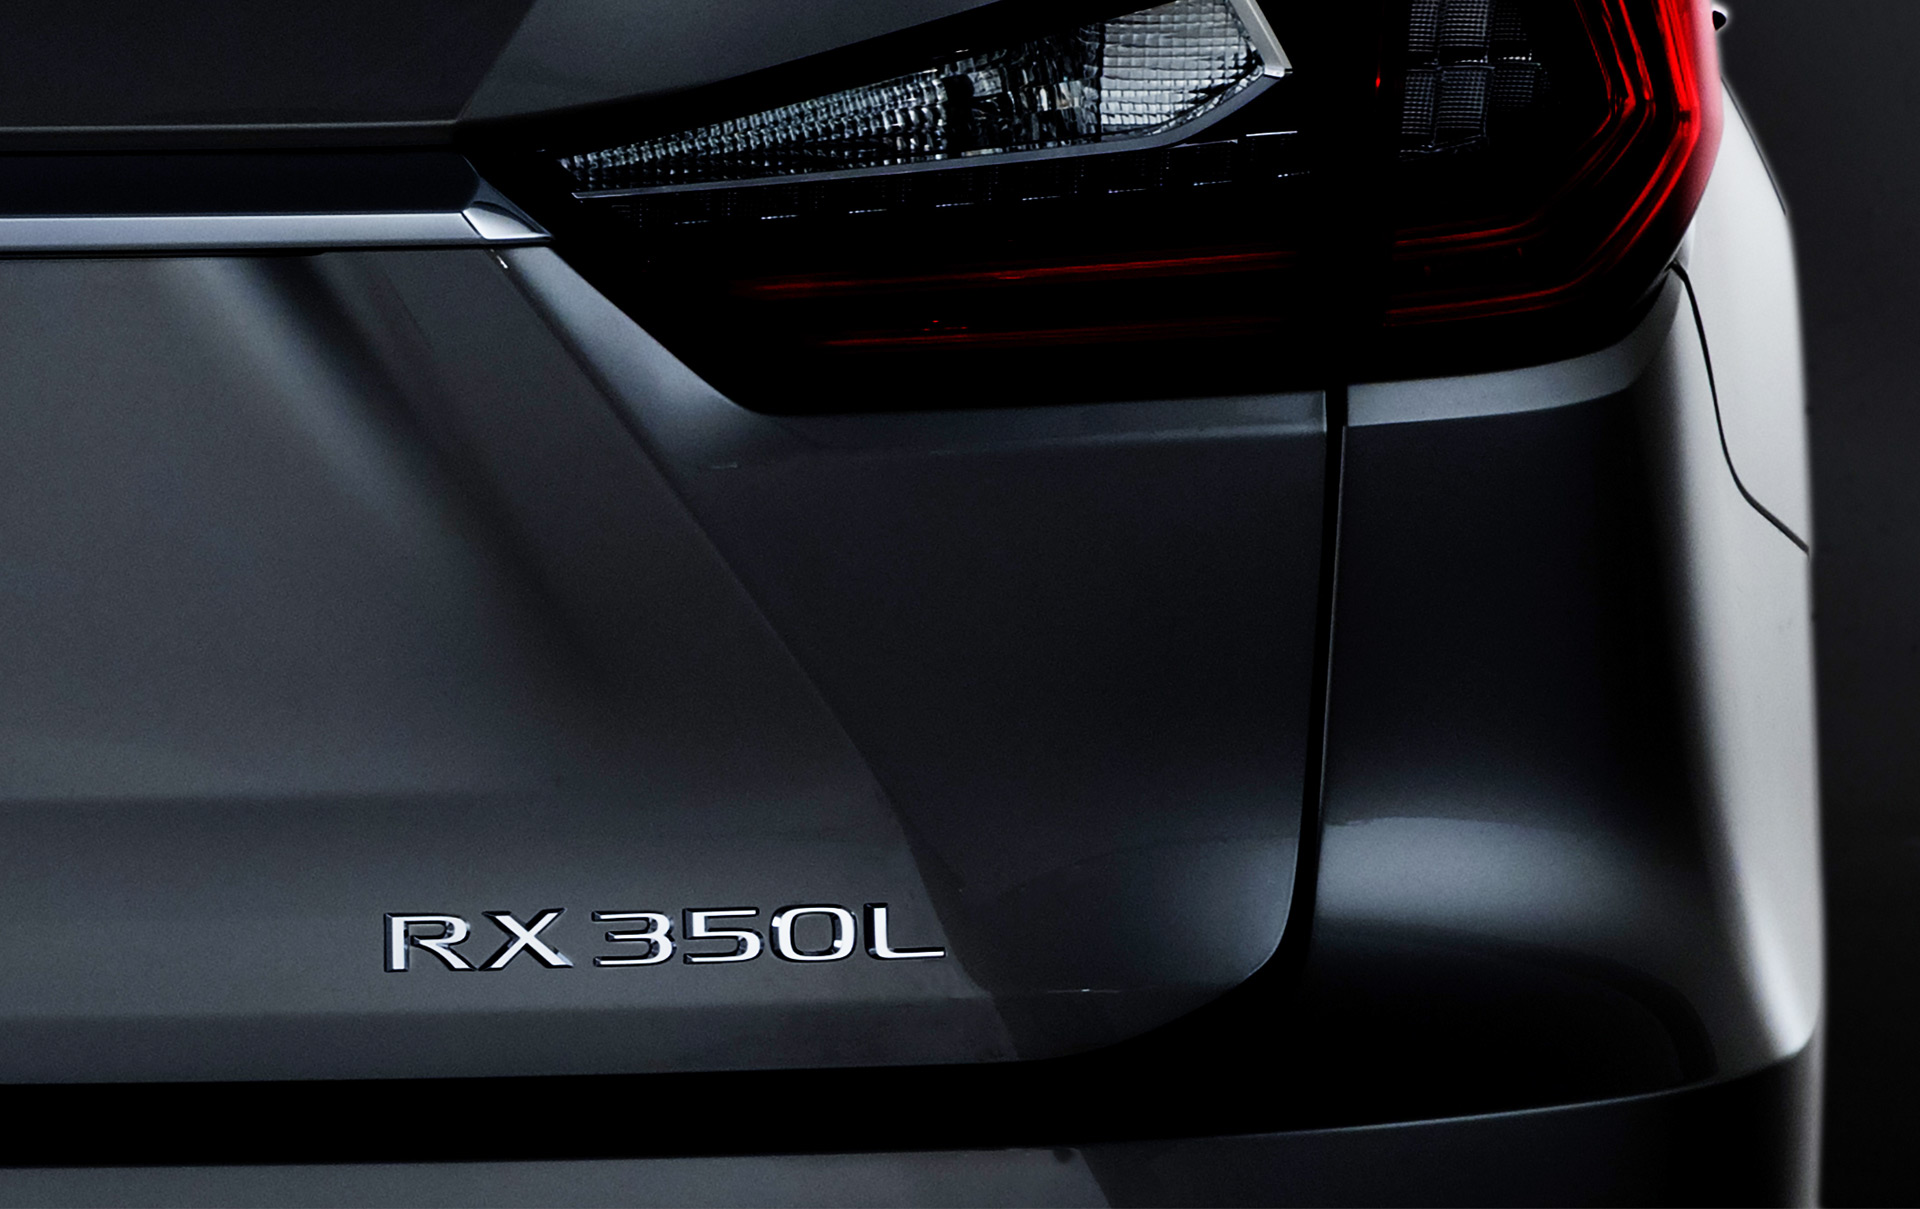 Lexus 3 Row Suv >> 2018 Lexus Rx L 3 Row Suv To Debut At 2017 La Auto Show